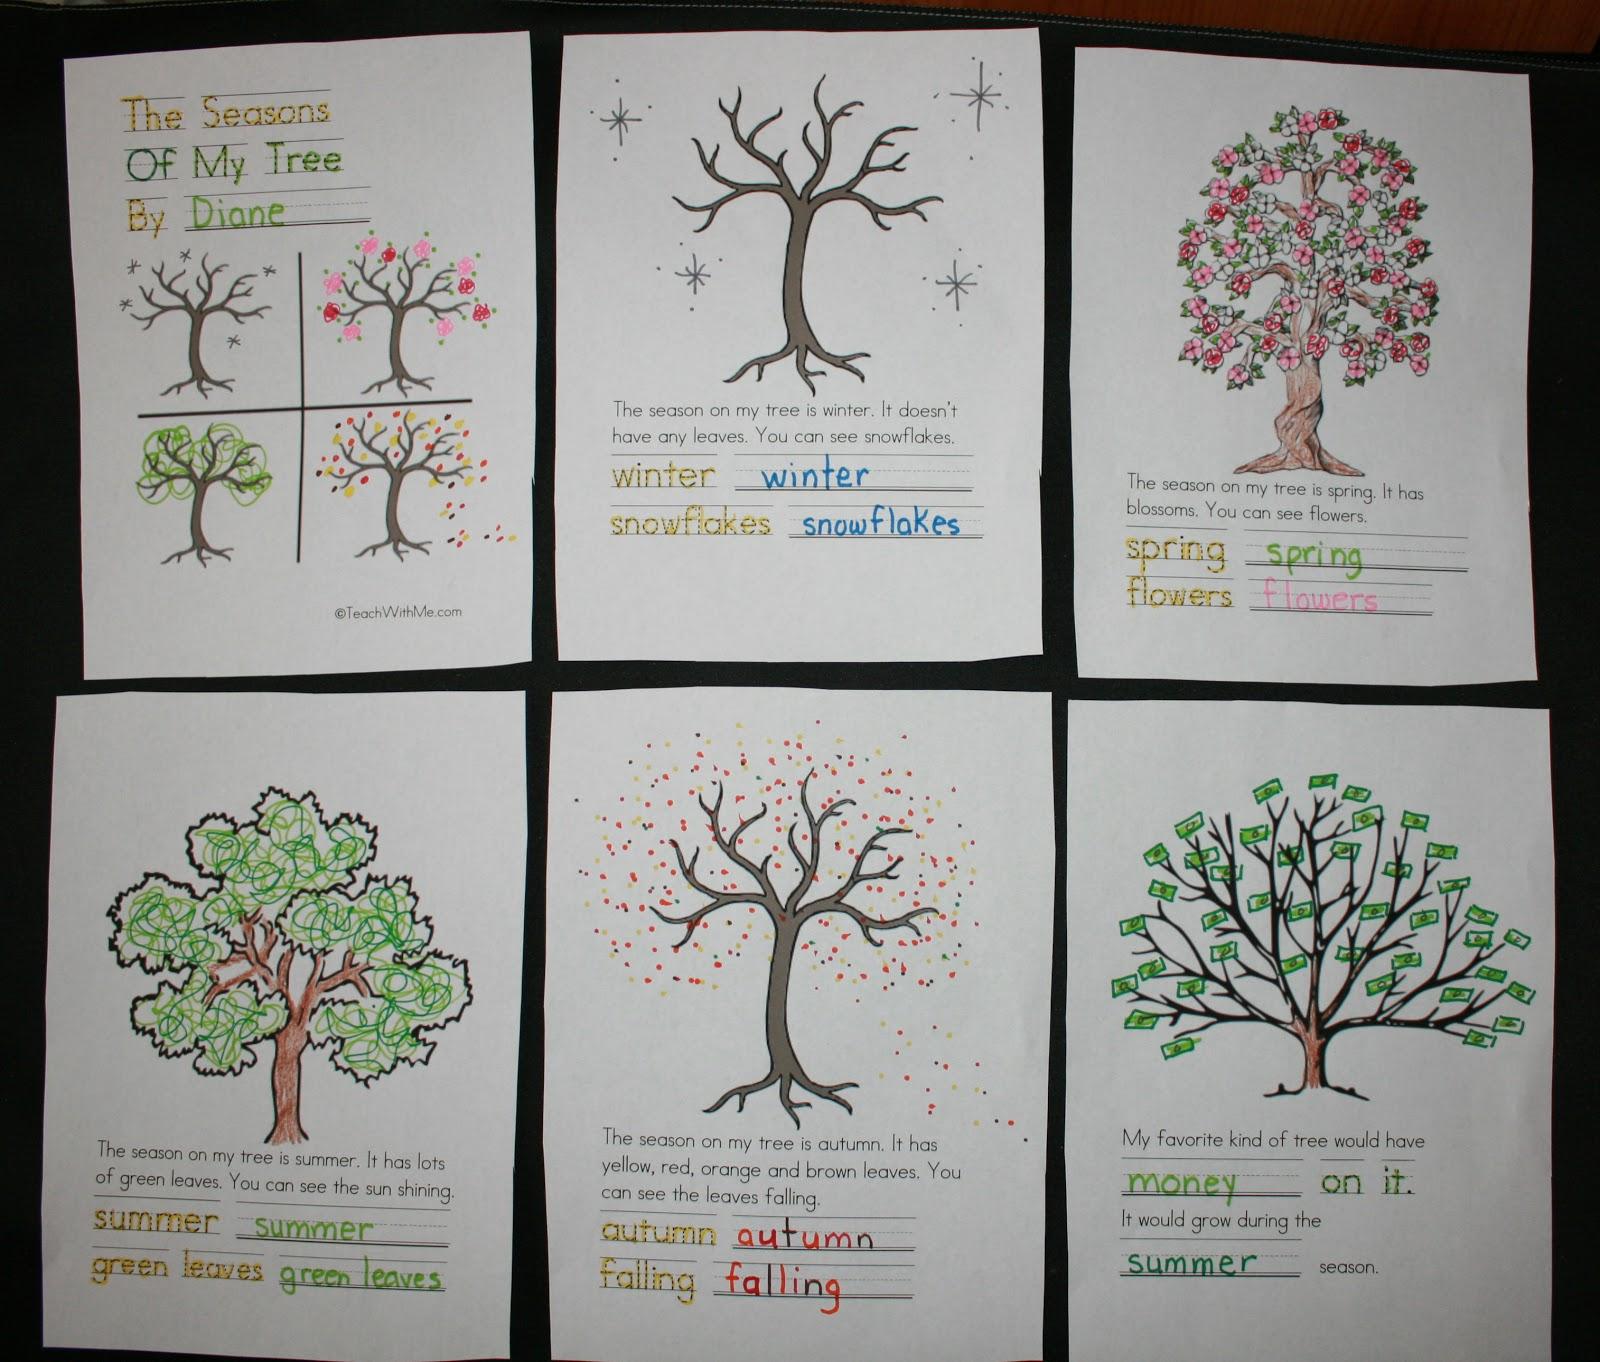 The Seasons Of My Tree